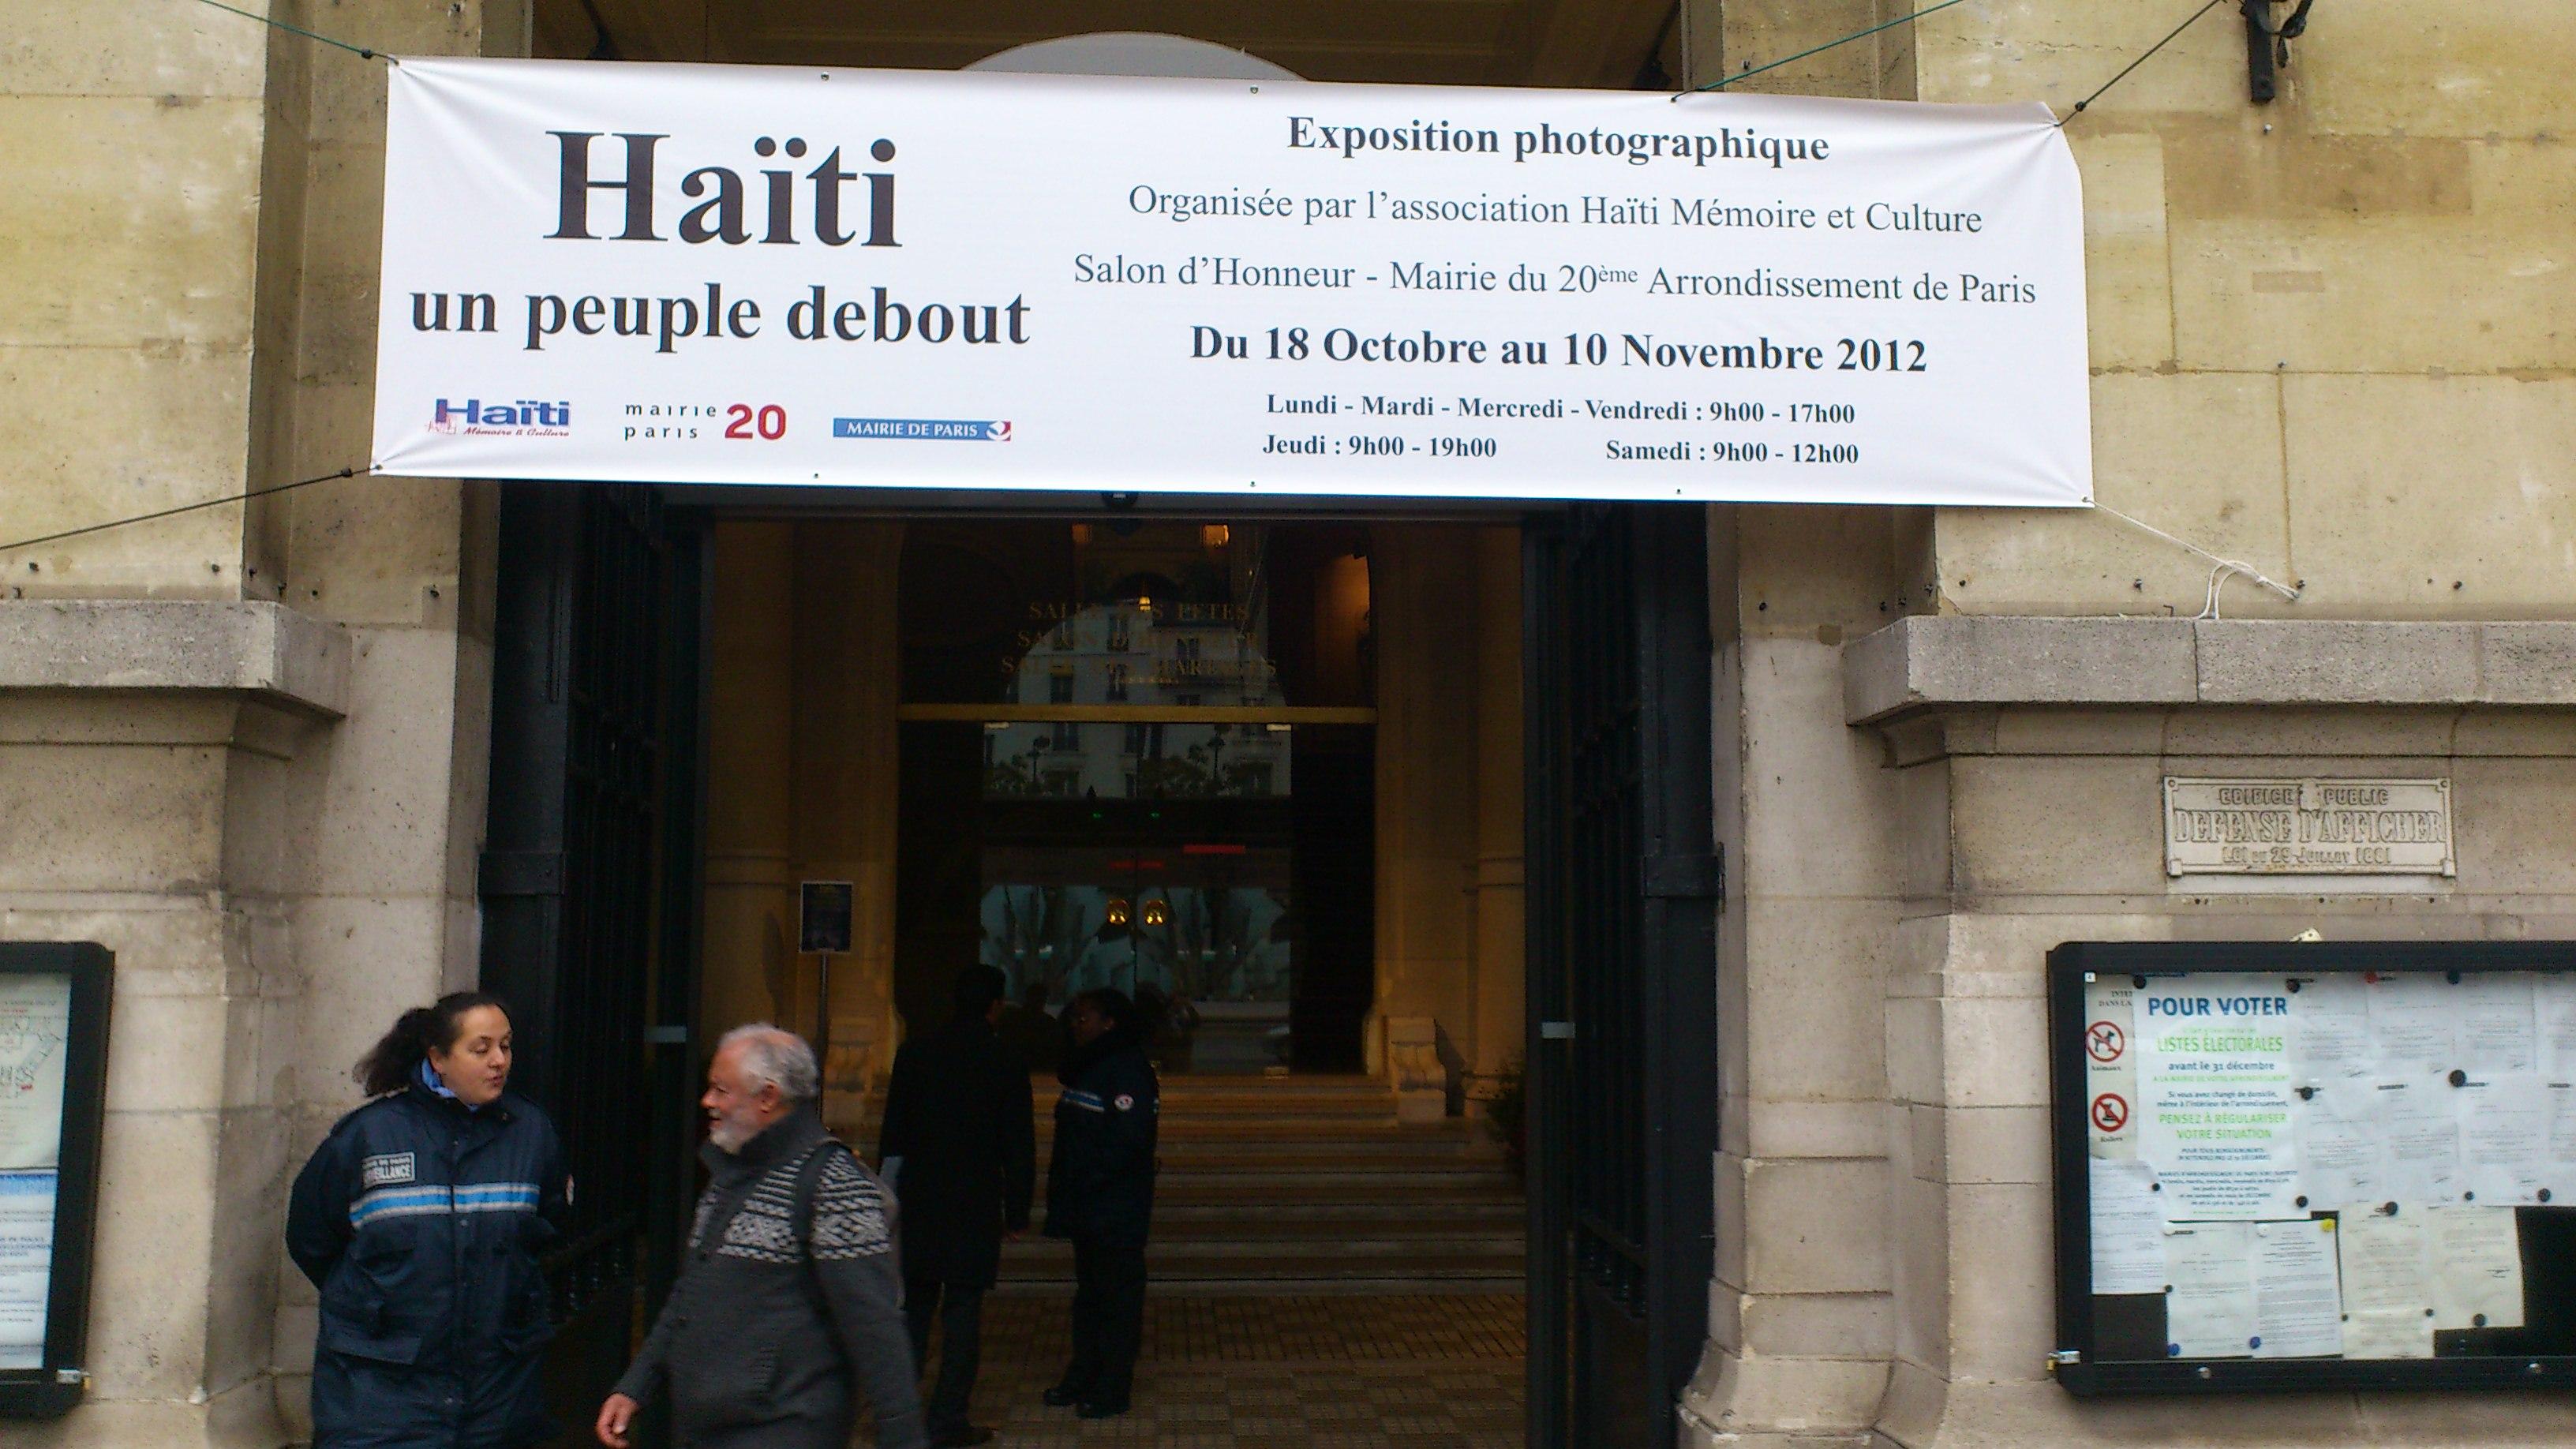 Haiti un peuple debout